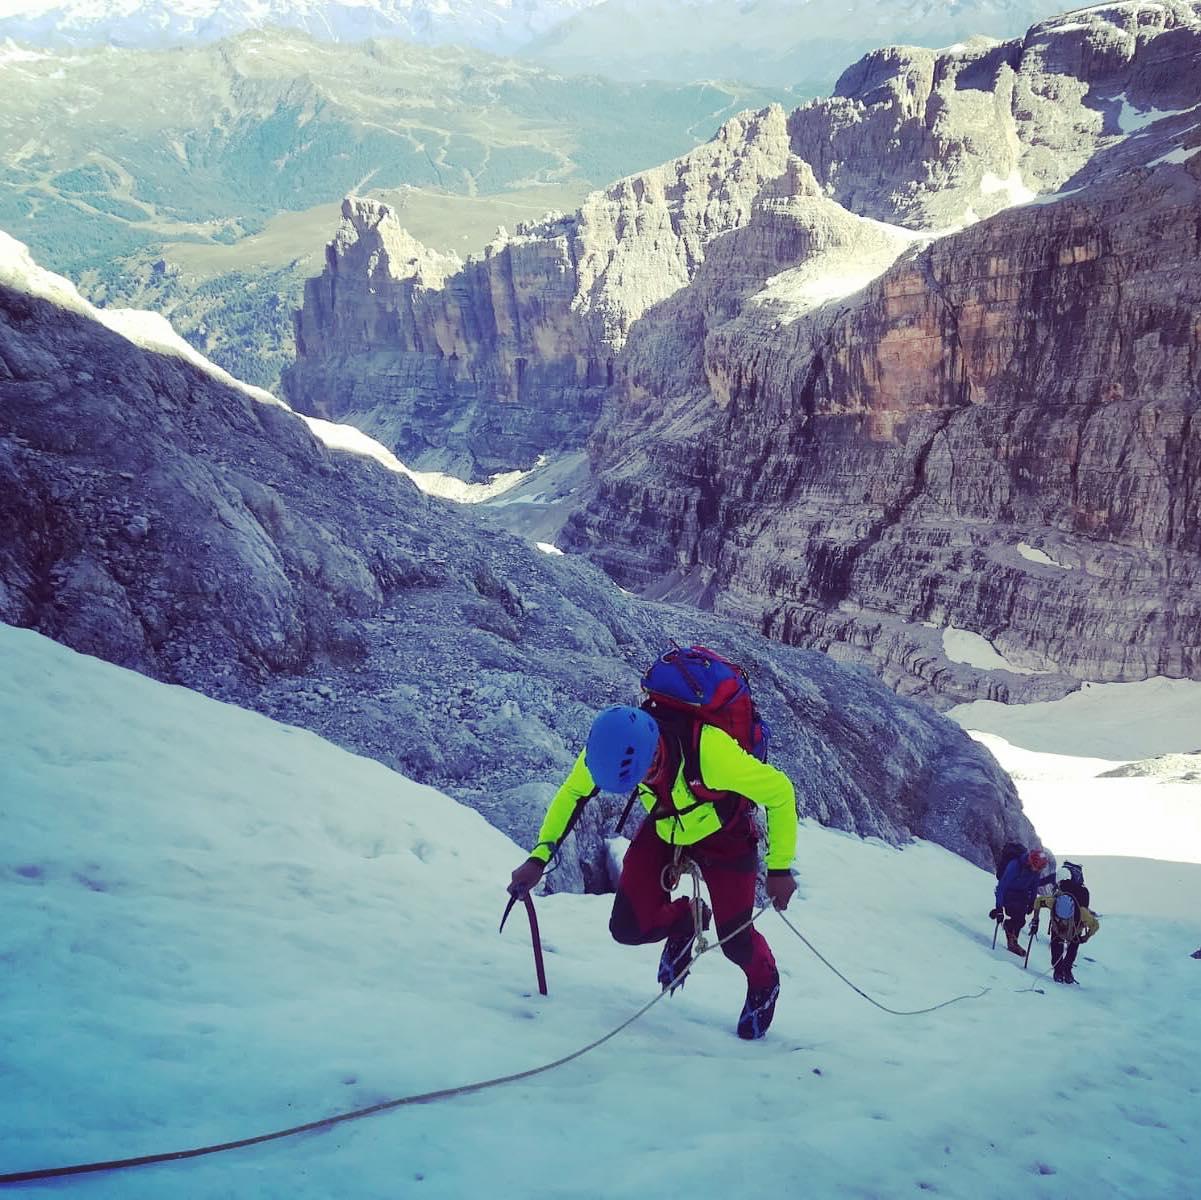 arrampicata ghiaccio lagorai pieve tesino